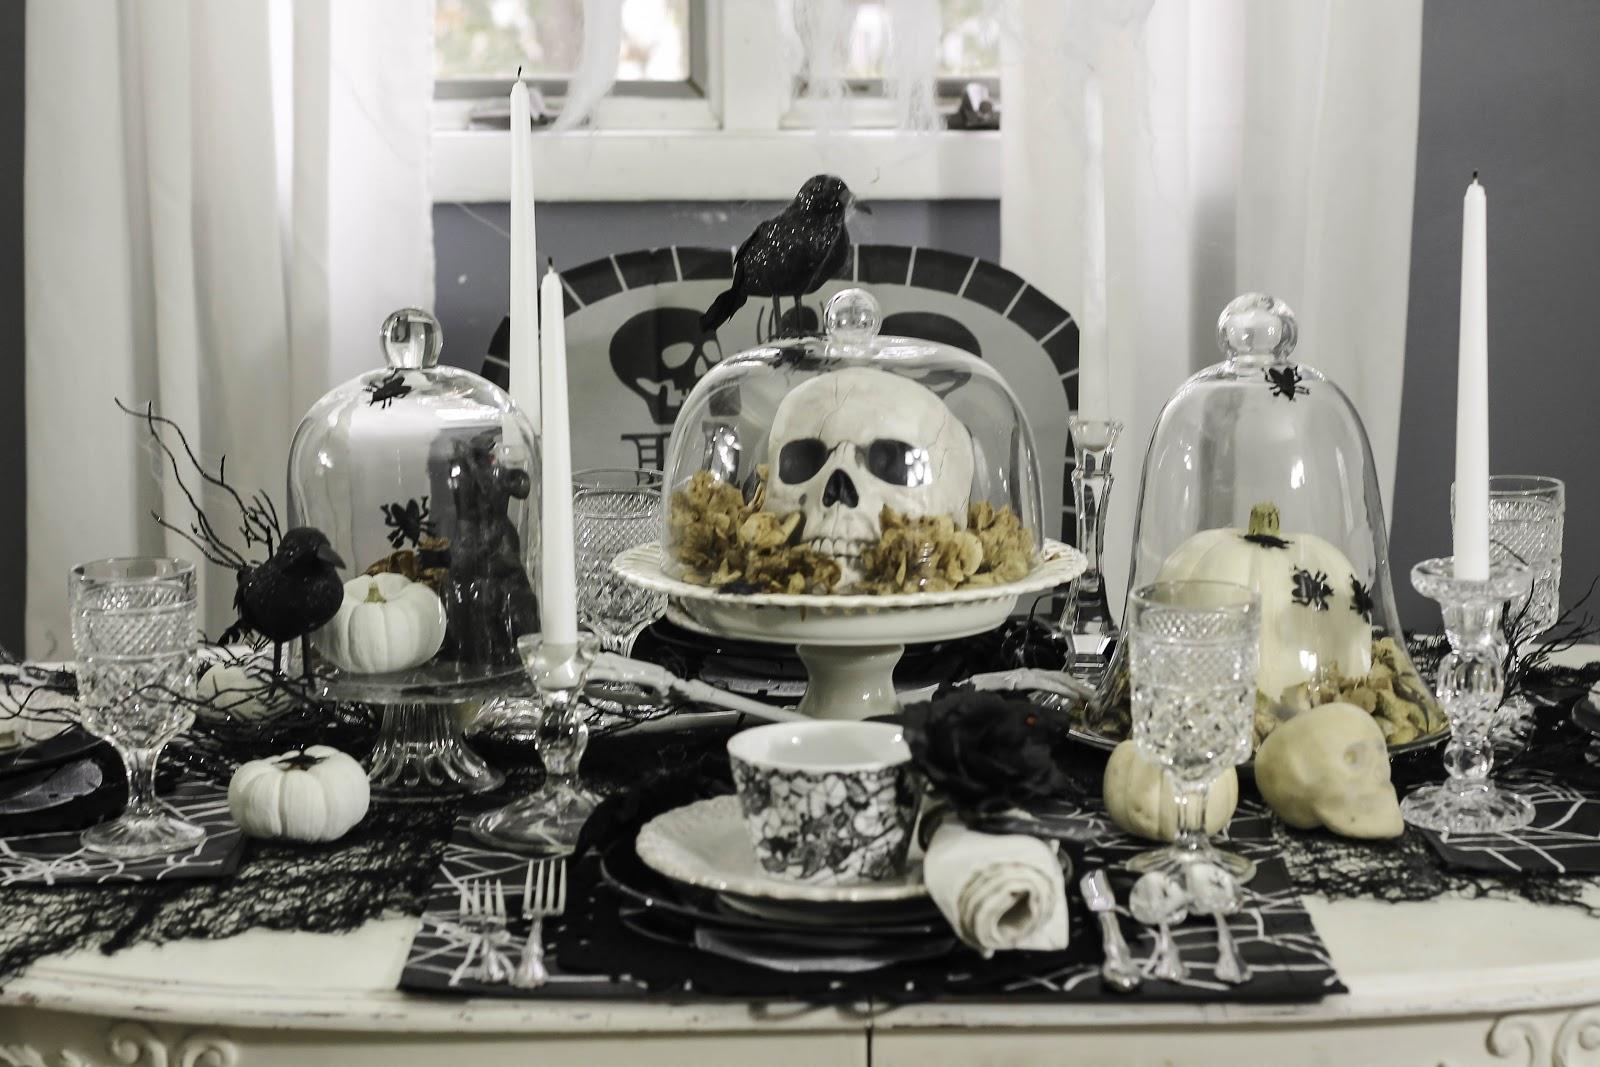 Halloween buffet table - Halloween Buffet Table Halloween Buffet Table Its Always Fun Decorating For Halloween I Usually Set